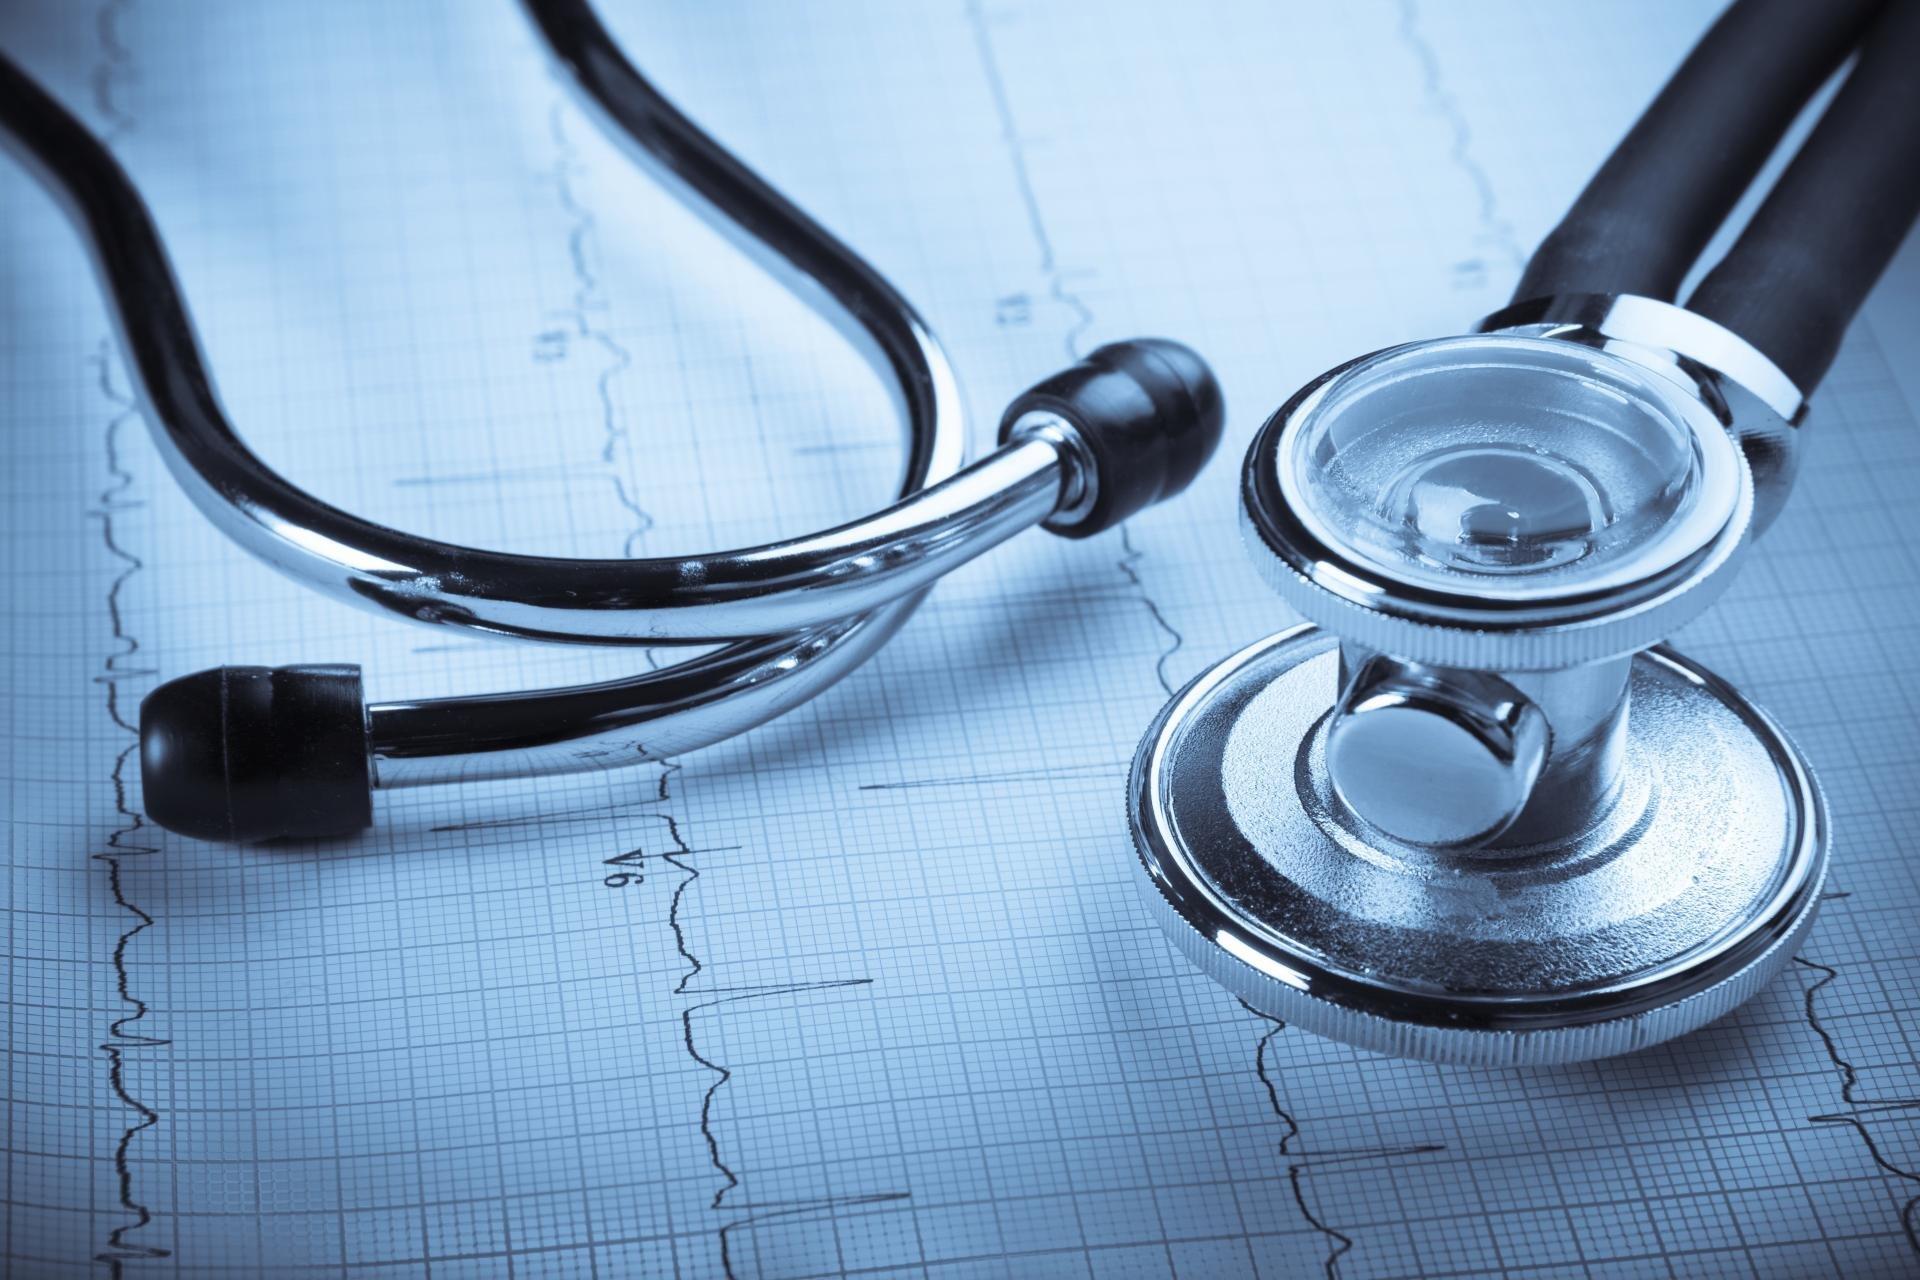 Medical Wallpapers Hd For Desktop Backgrounds